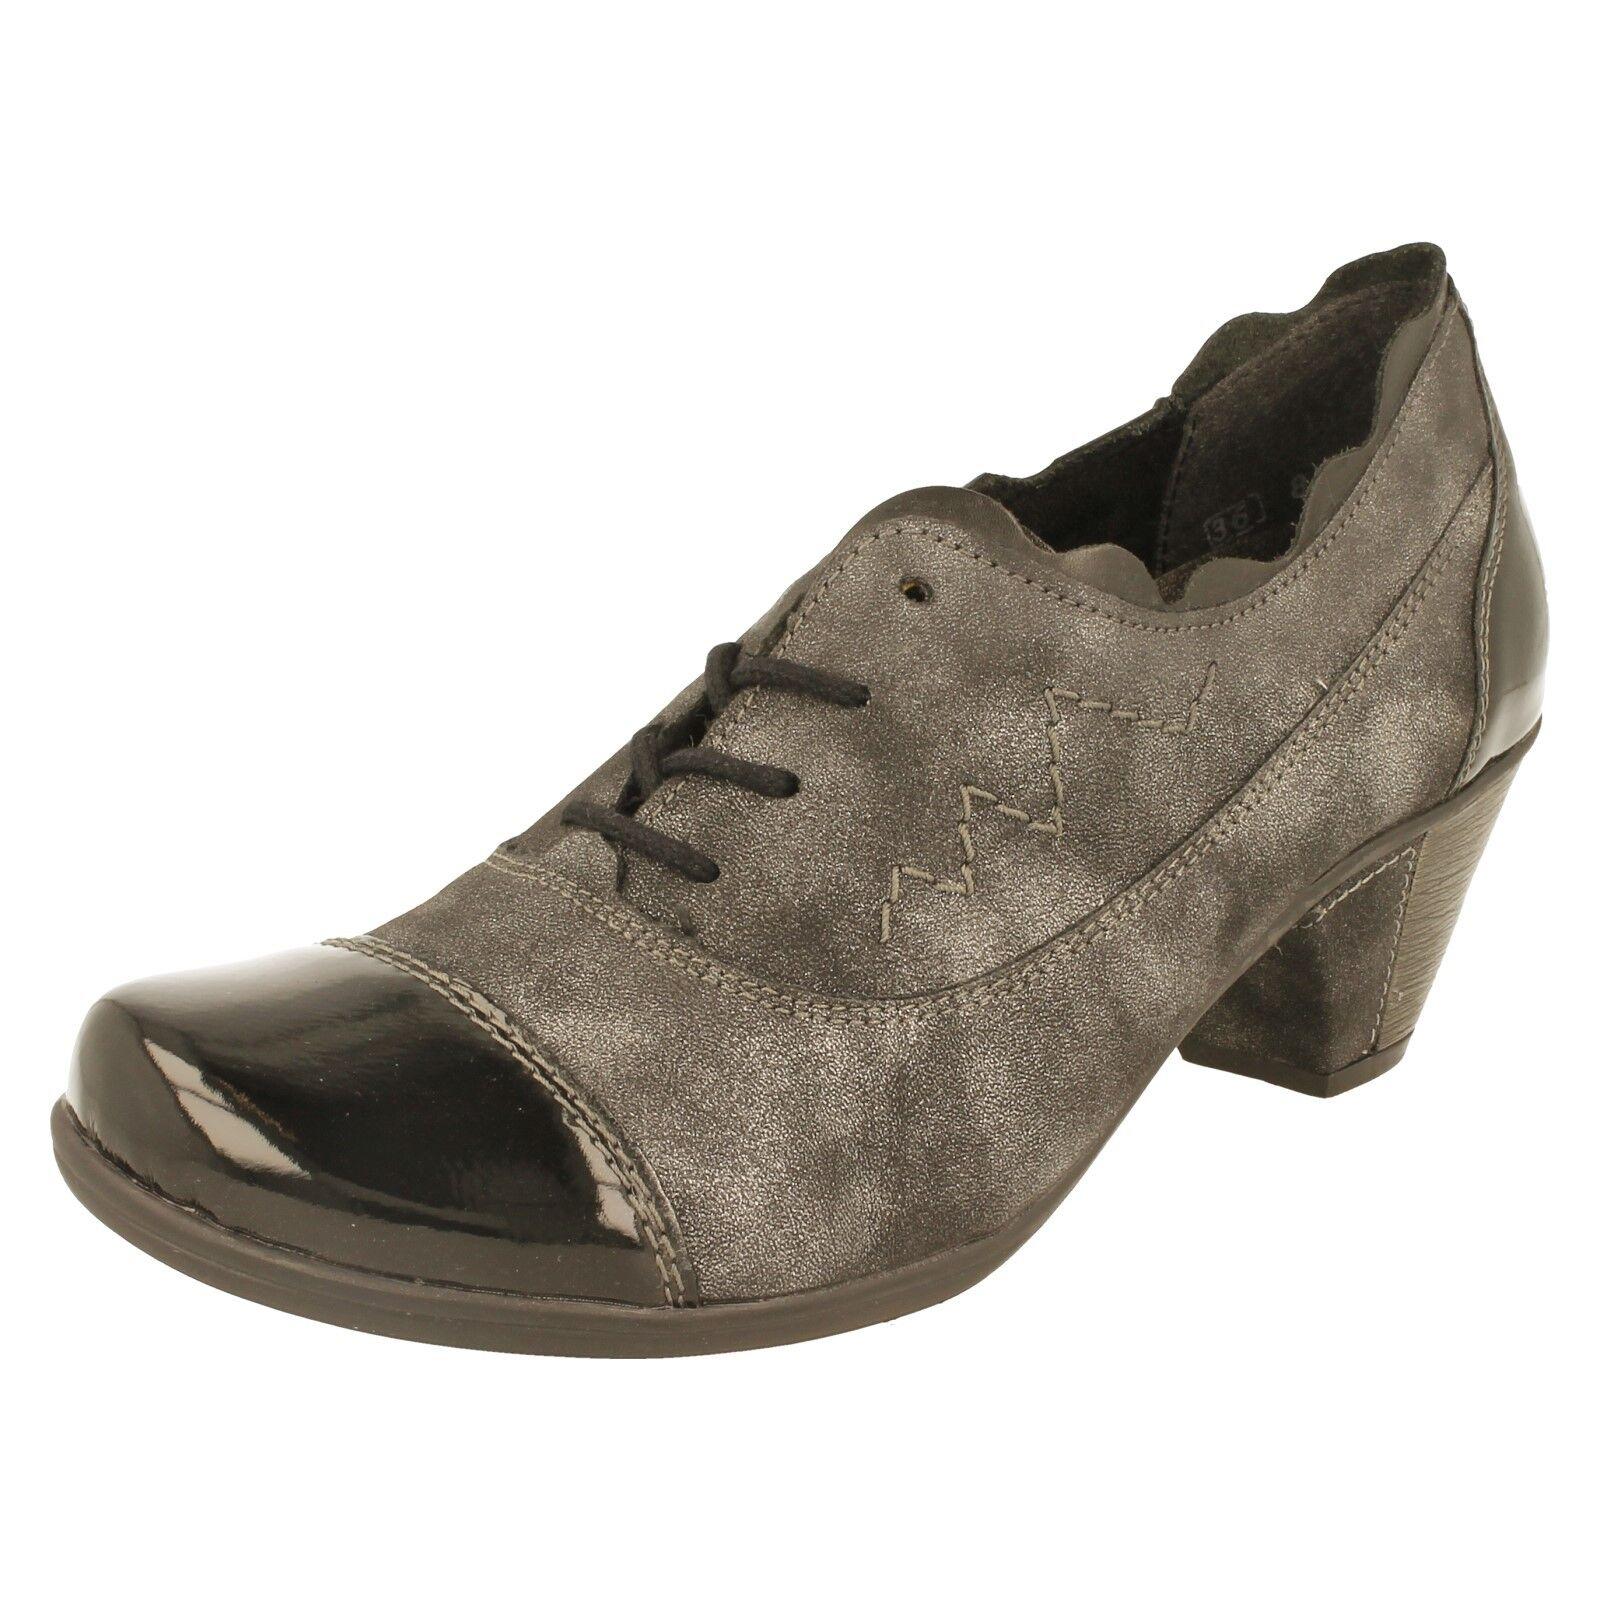 Damen Remonte Absatz Schuhe - D1210